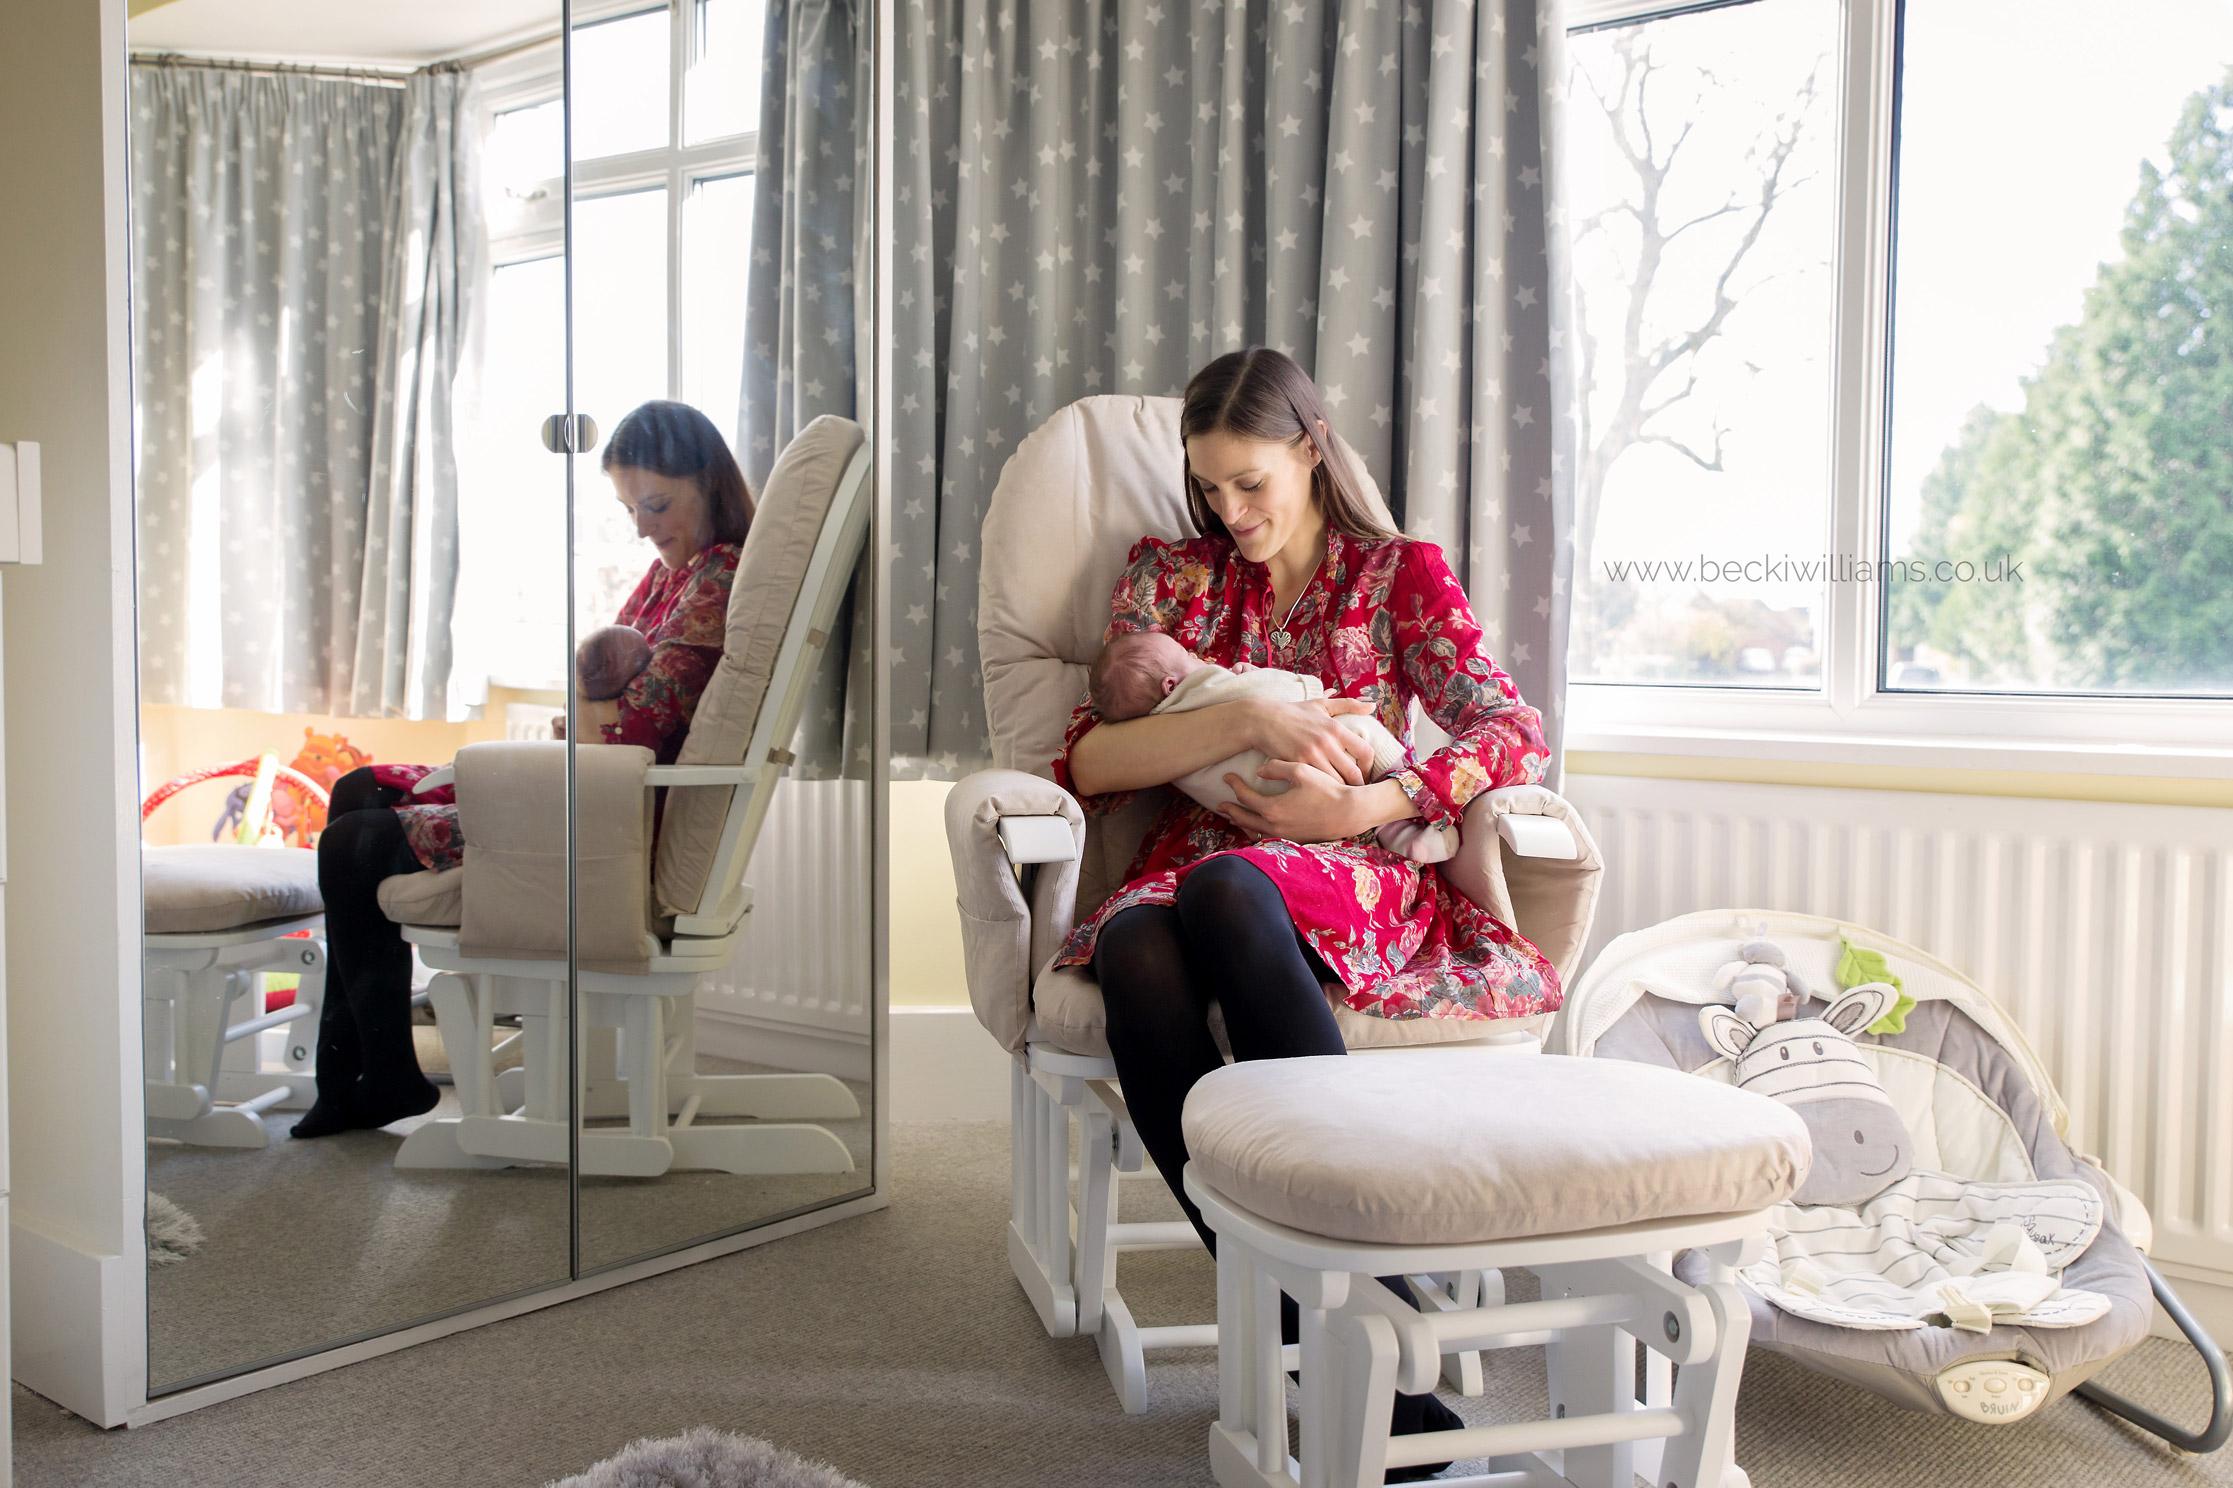 new mum sitting her newborn baby girl's neutral nursery on a rocking chair, holding her baby